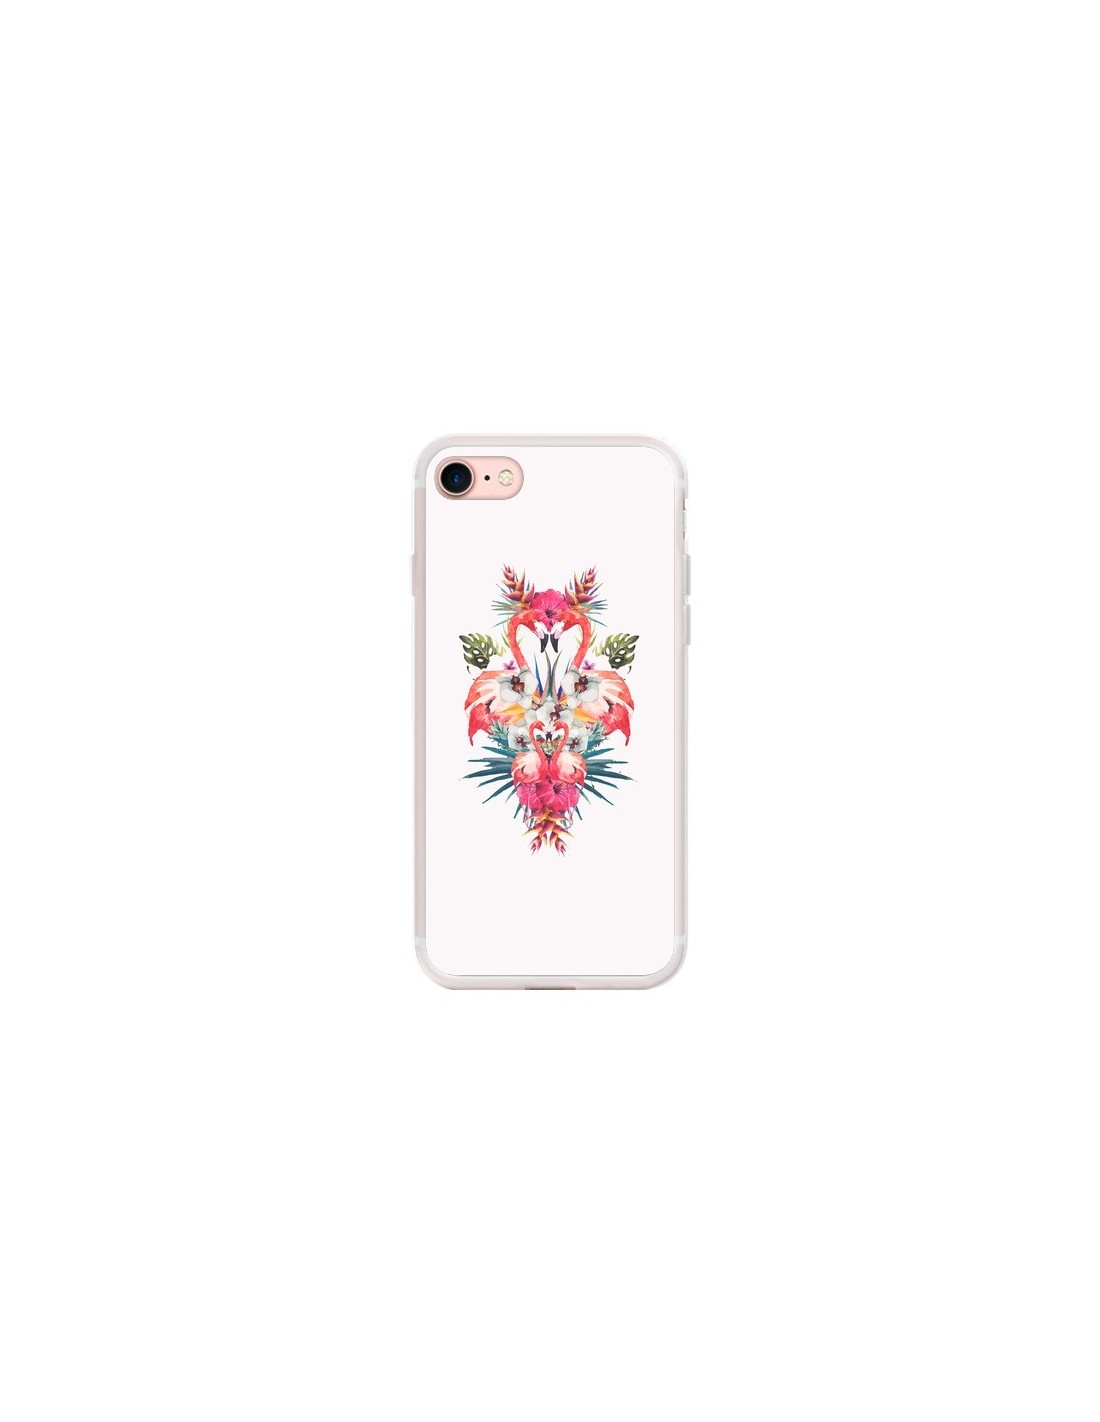 coque iphone 7 8 se 2020 tropicales flamingos tropical flamant rose summer ete eleaxart